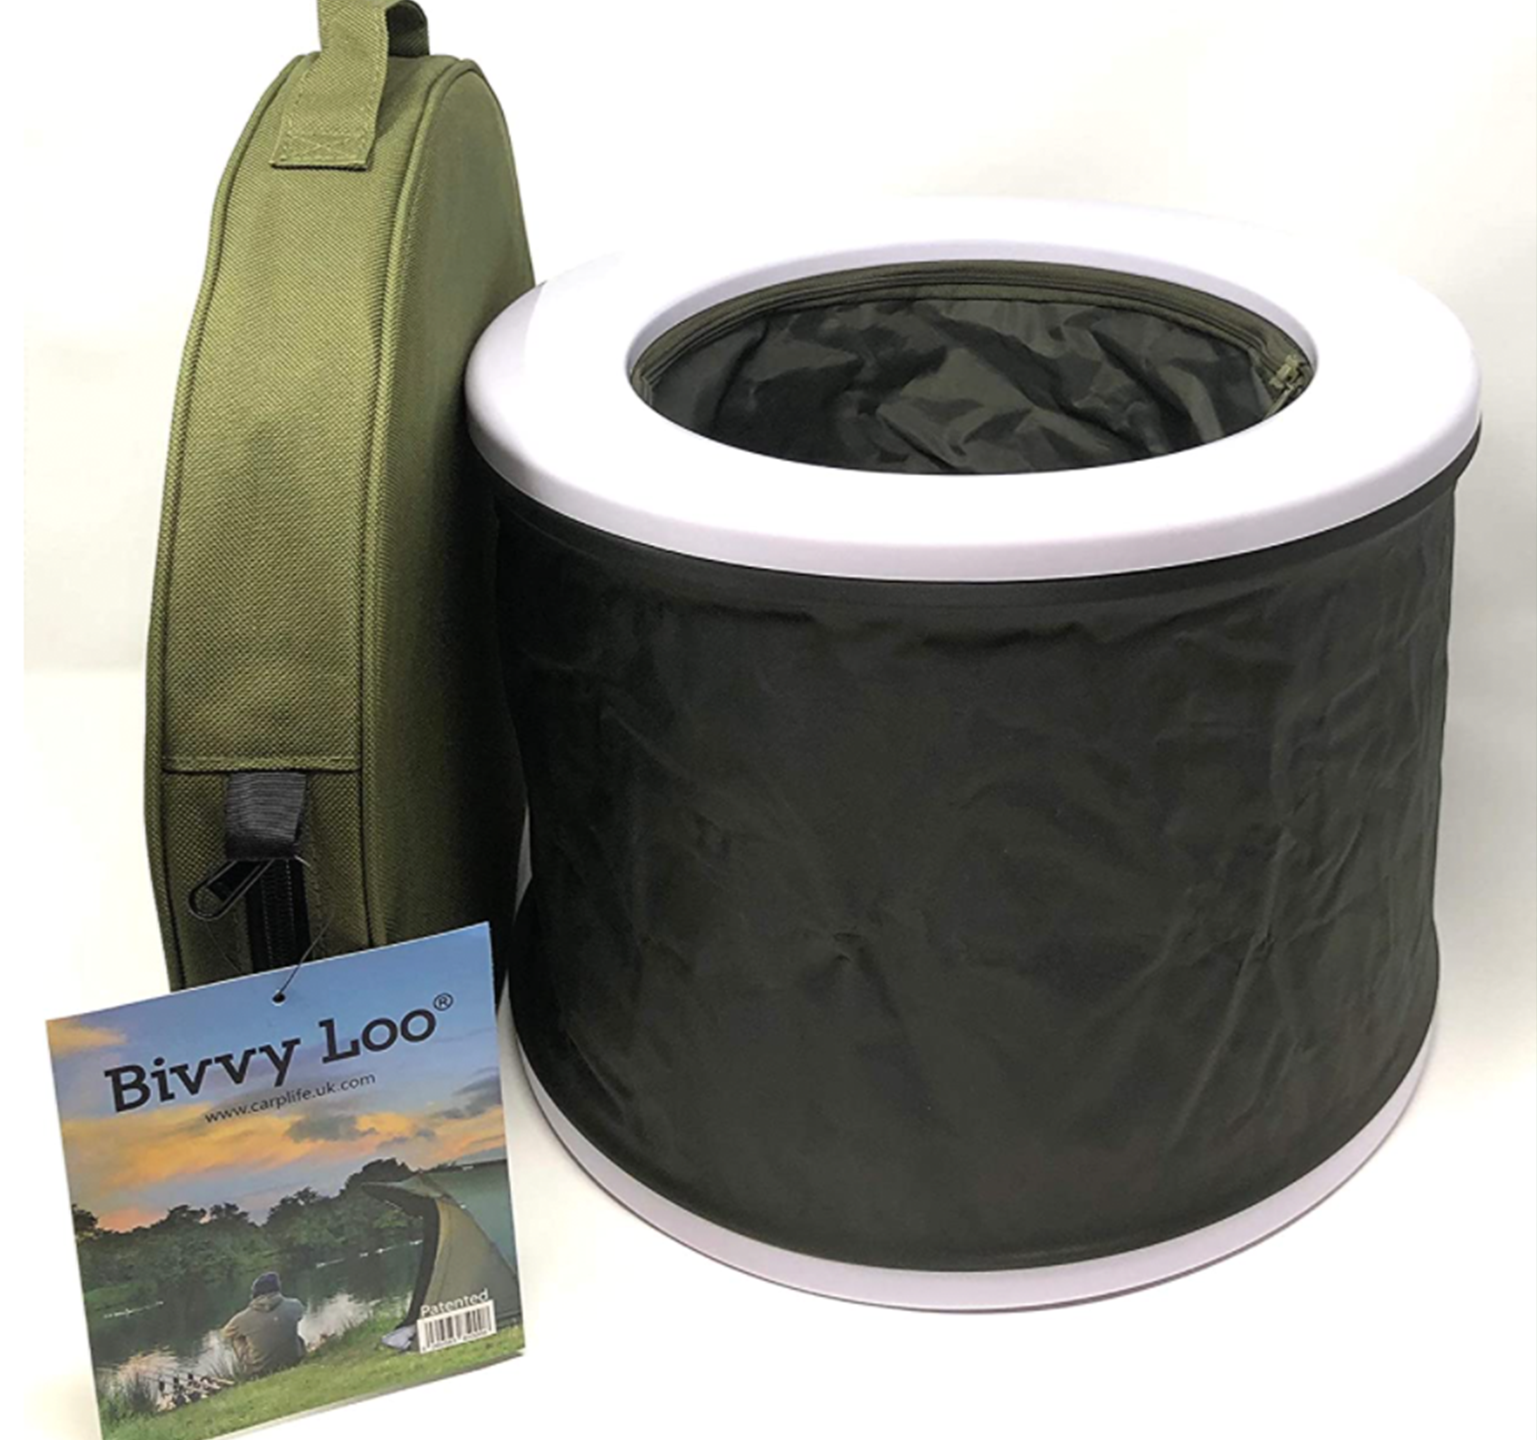 bivvy loo toilettes carplife